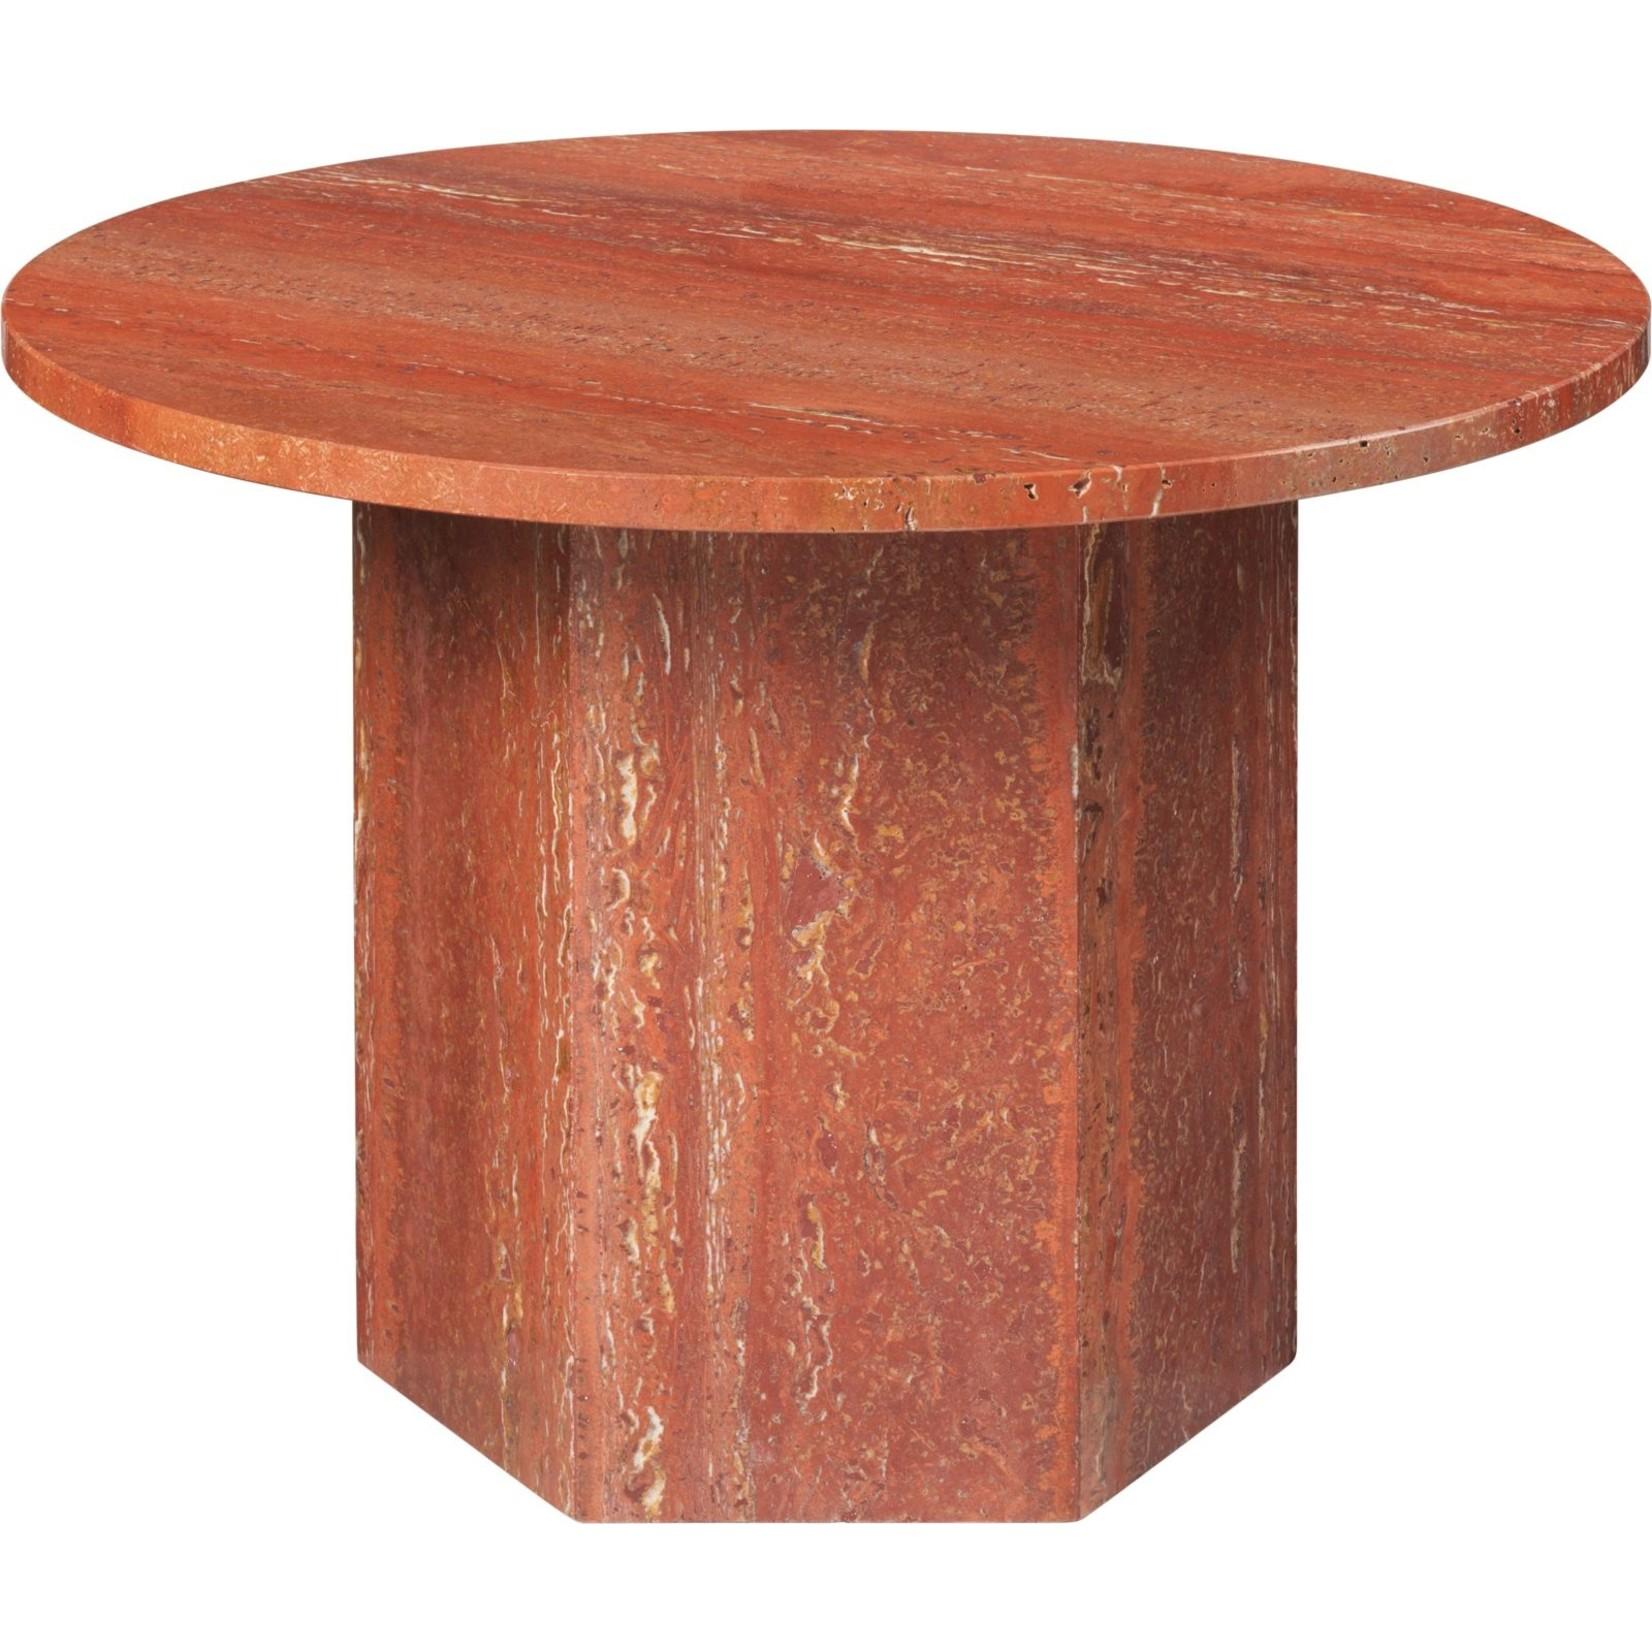 Gubi Epic Coffee Table Round Ø60 | Red Travertine